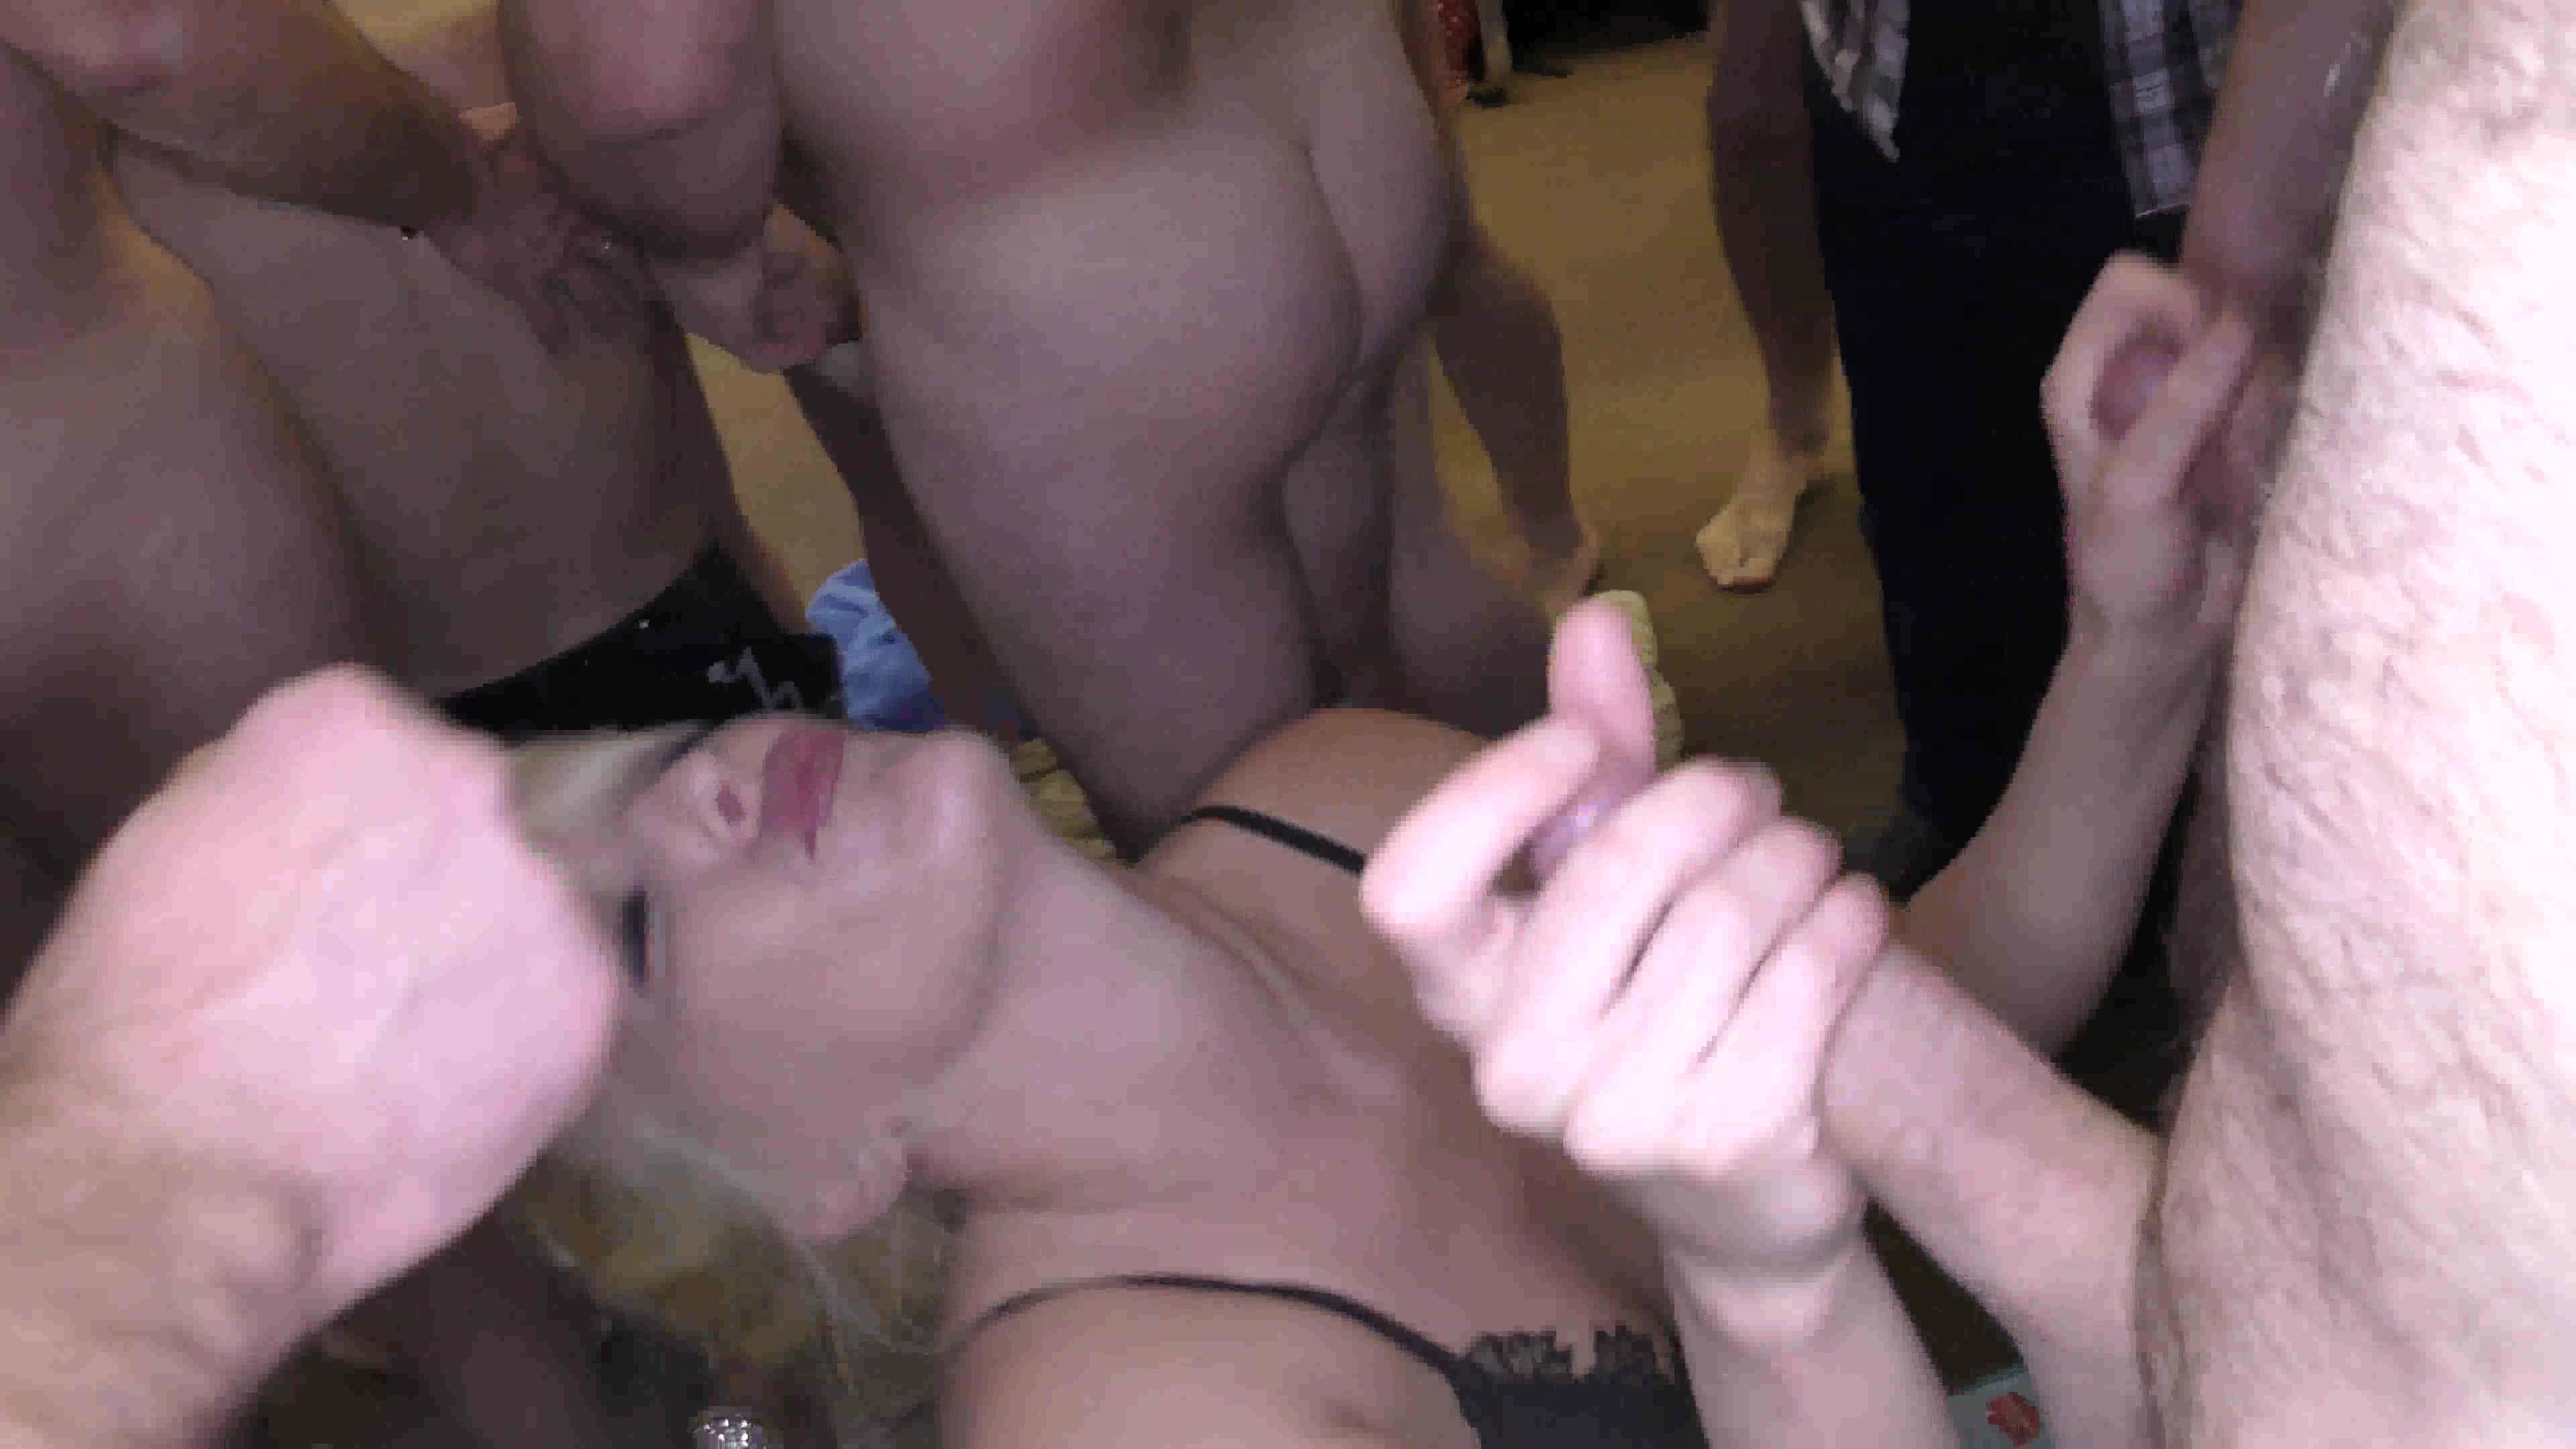 Teen nude large puffy breast selfie photos